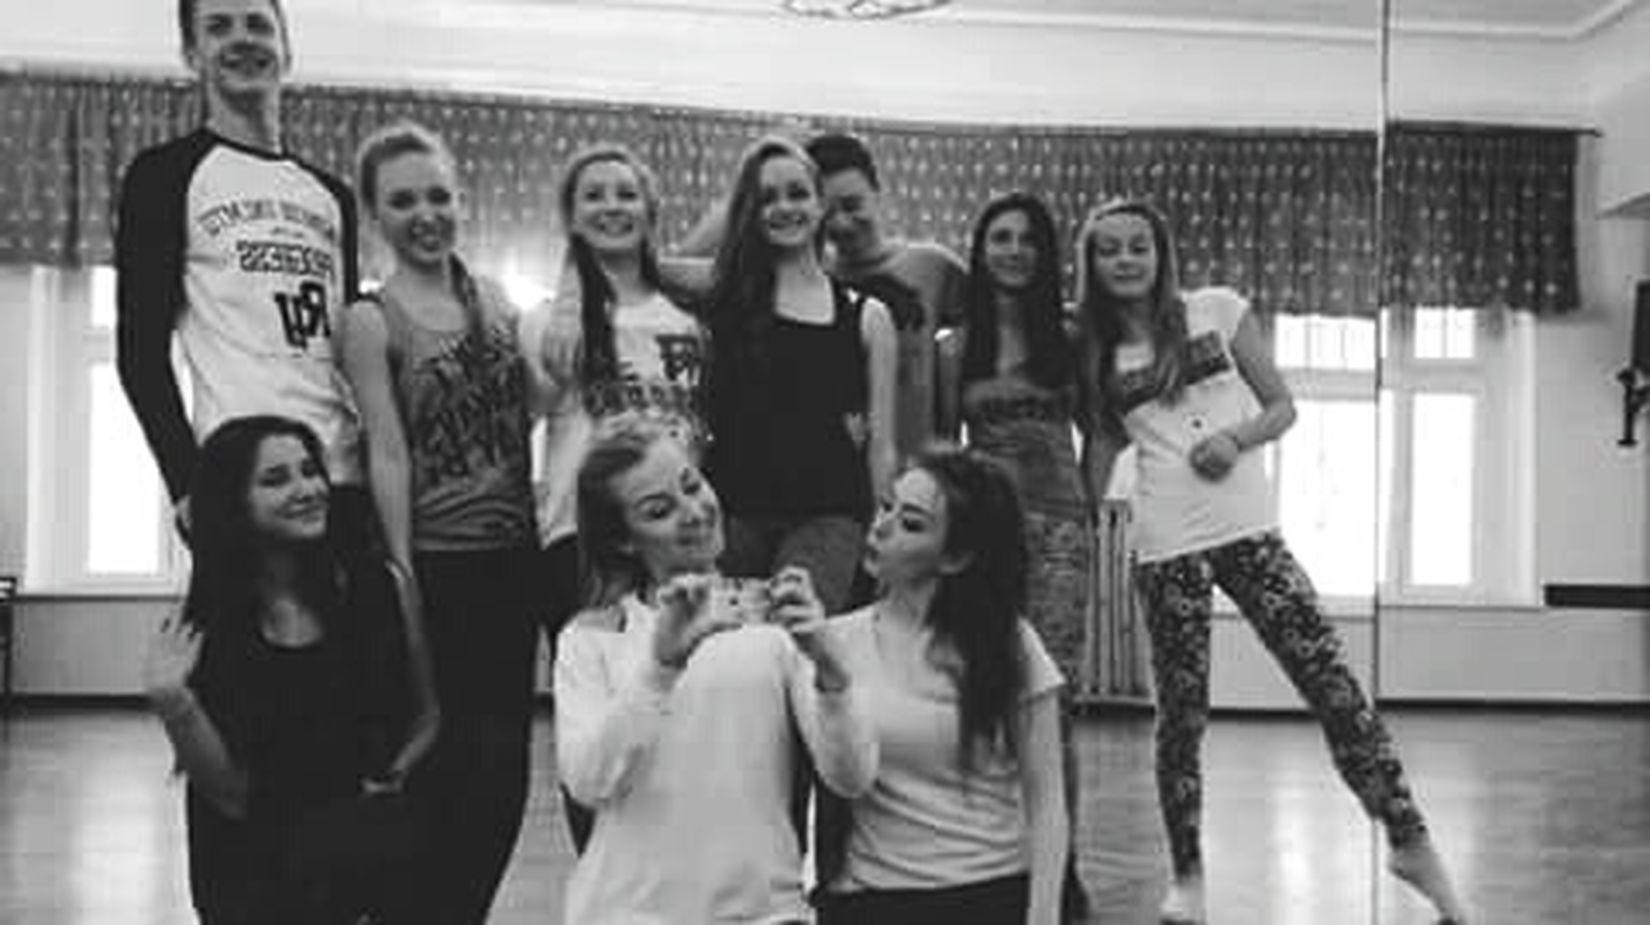 Bestcrew Dance Family Dancers Happy Friends Smiles Passion 🙊💕✌